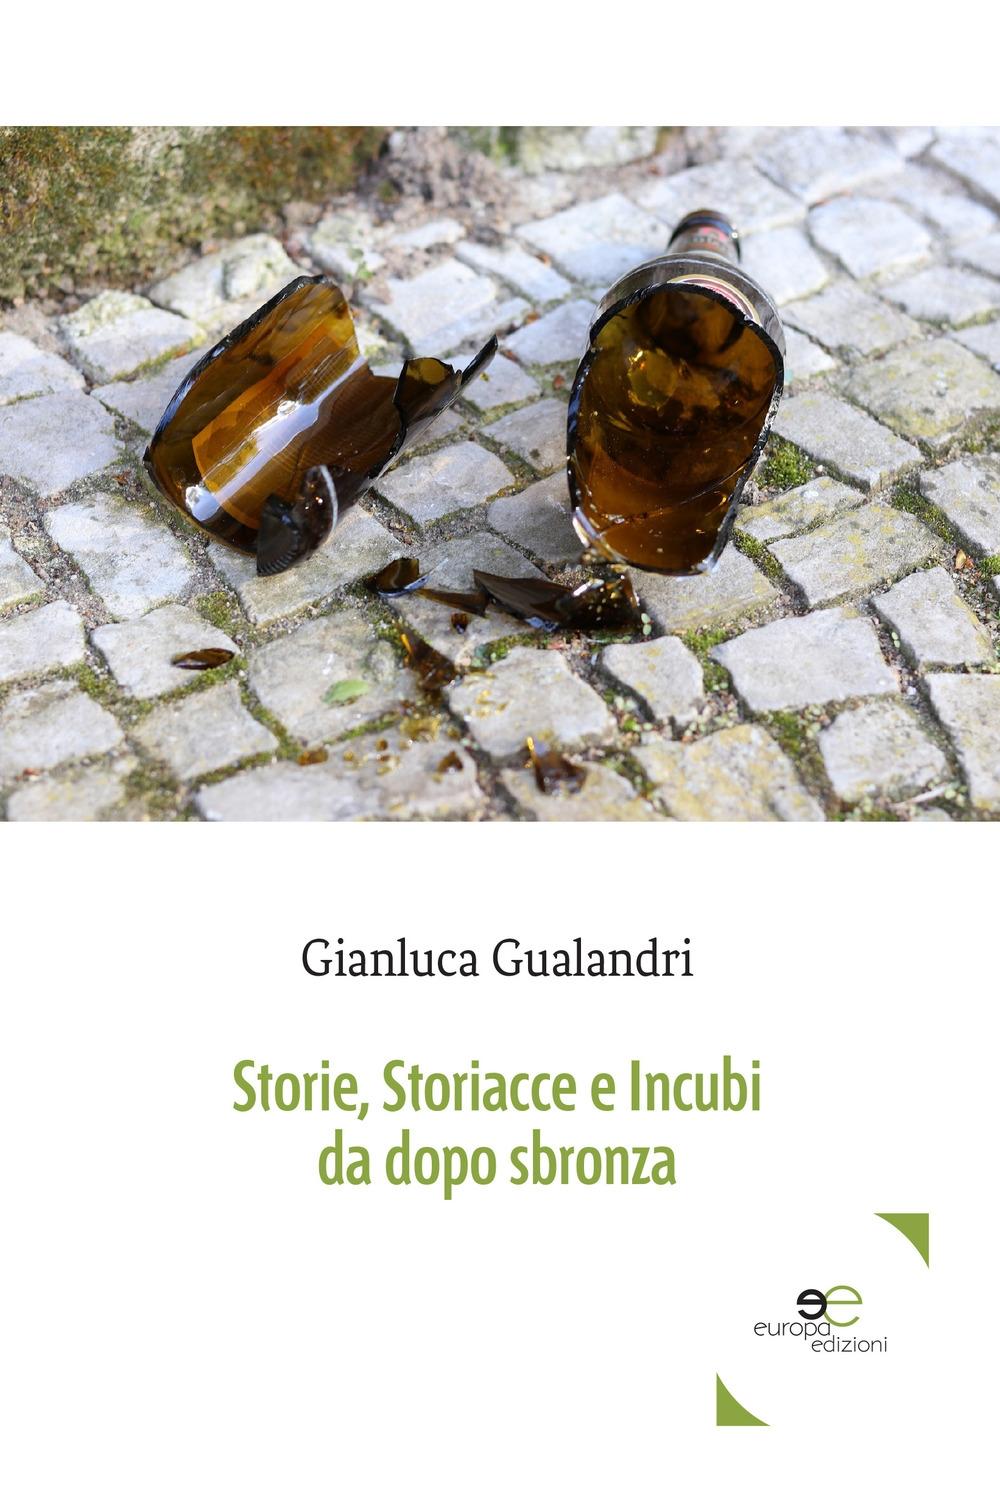 Storie, storiacce e incubi da dopo sbronza